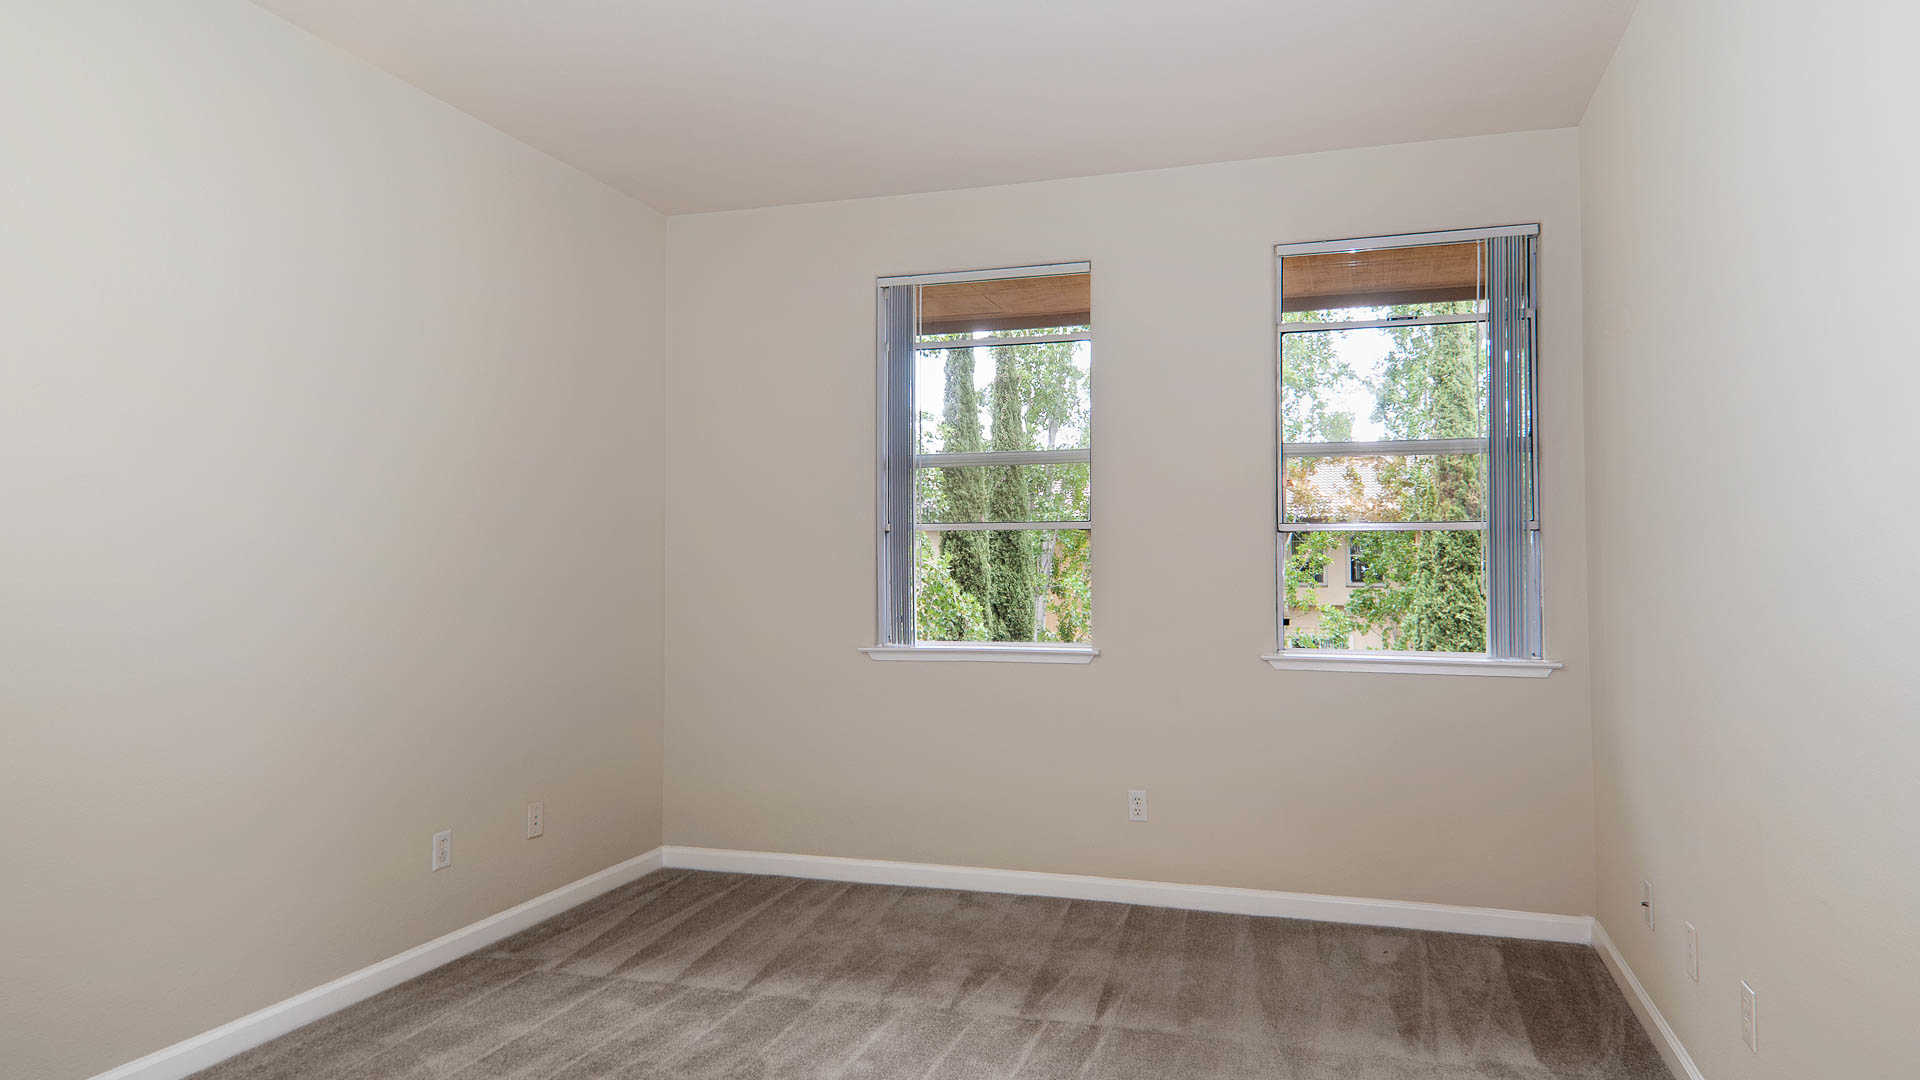 3 bedroom apartments santa clara : intercasher